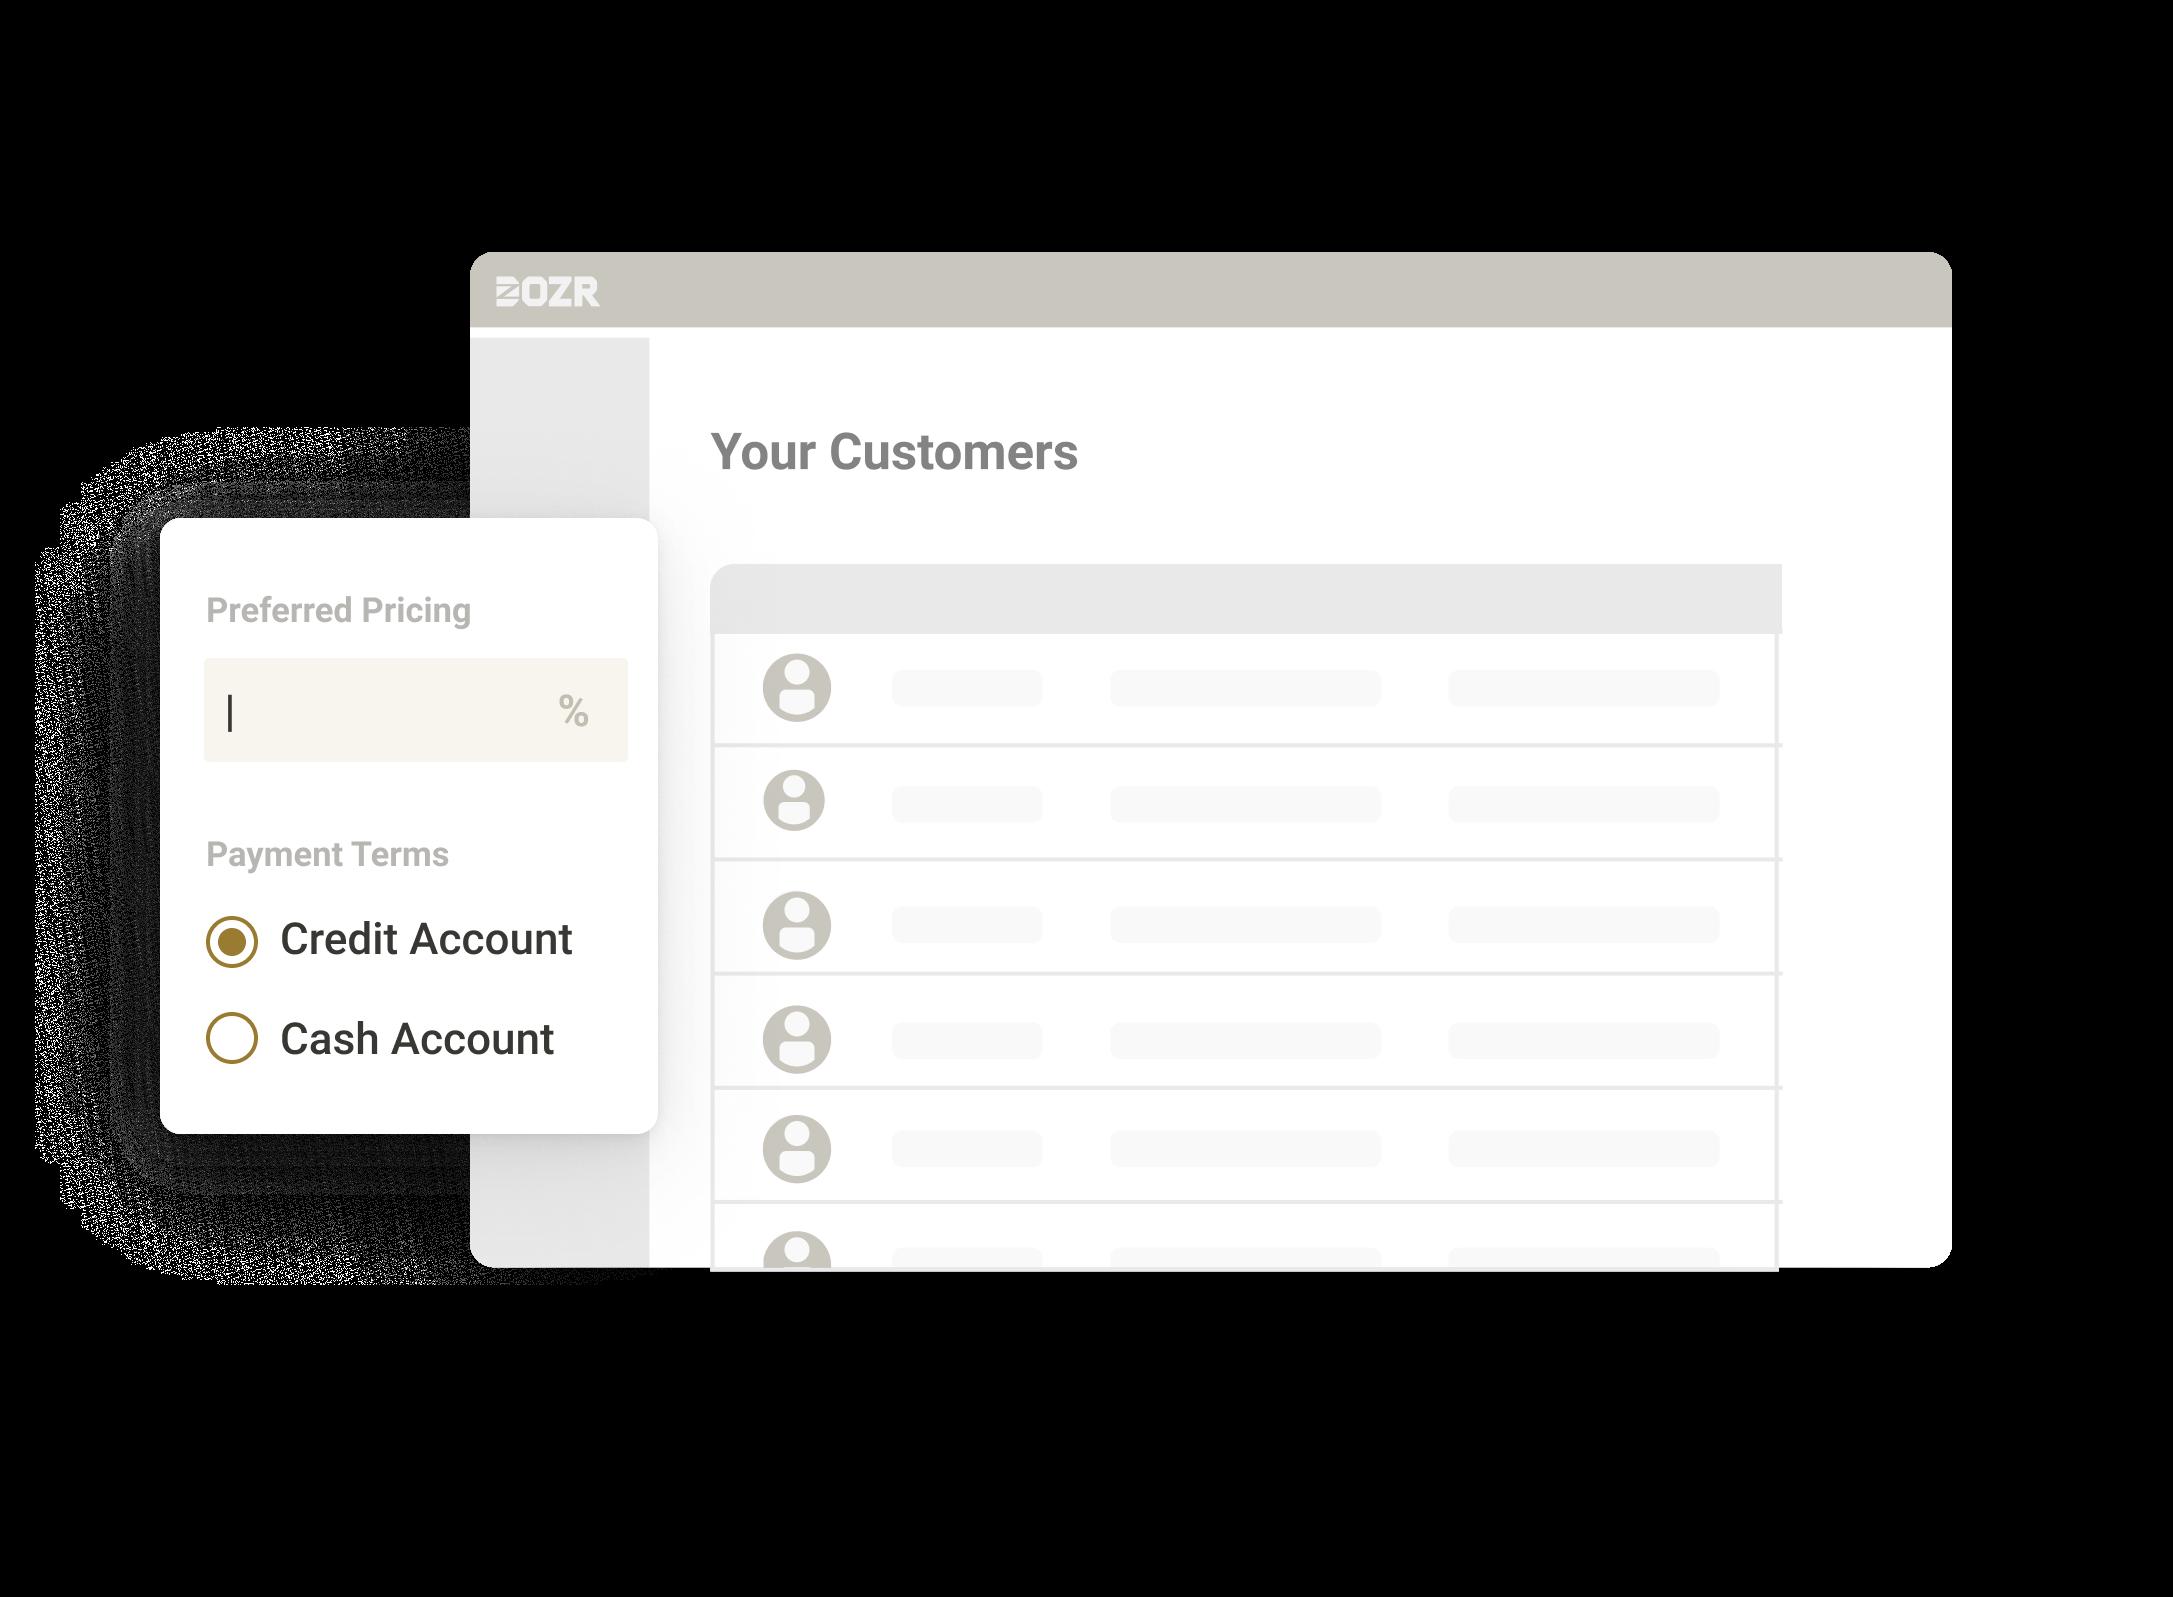 Customer list on DOZR SupplierHub